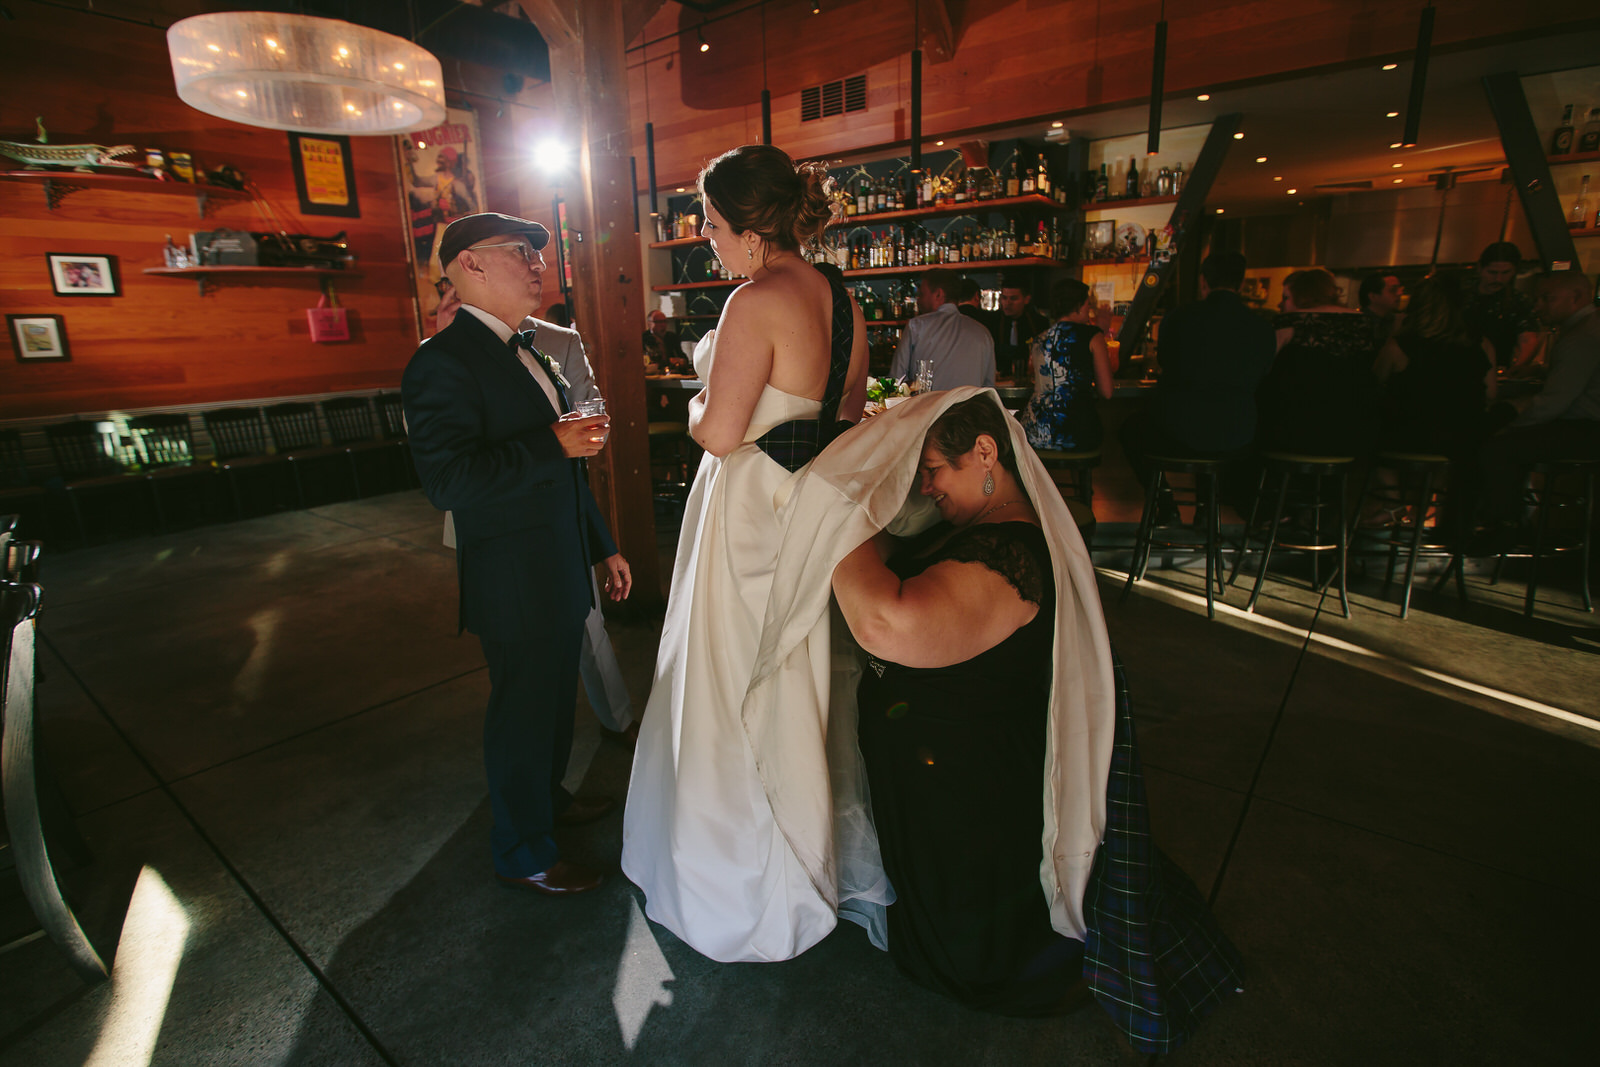 moments_wedding_reception_hilarious_bustle_bride_tiny_house_photo.jpg